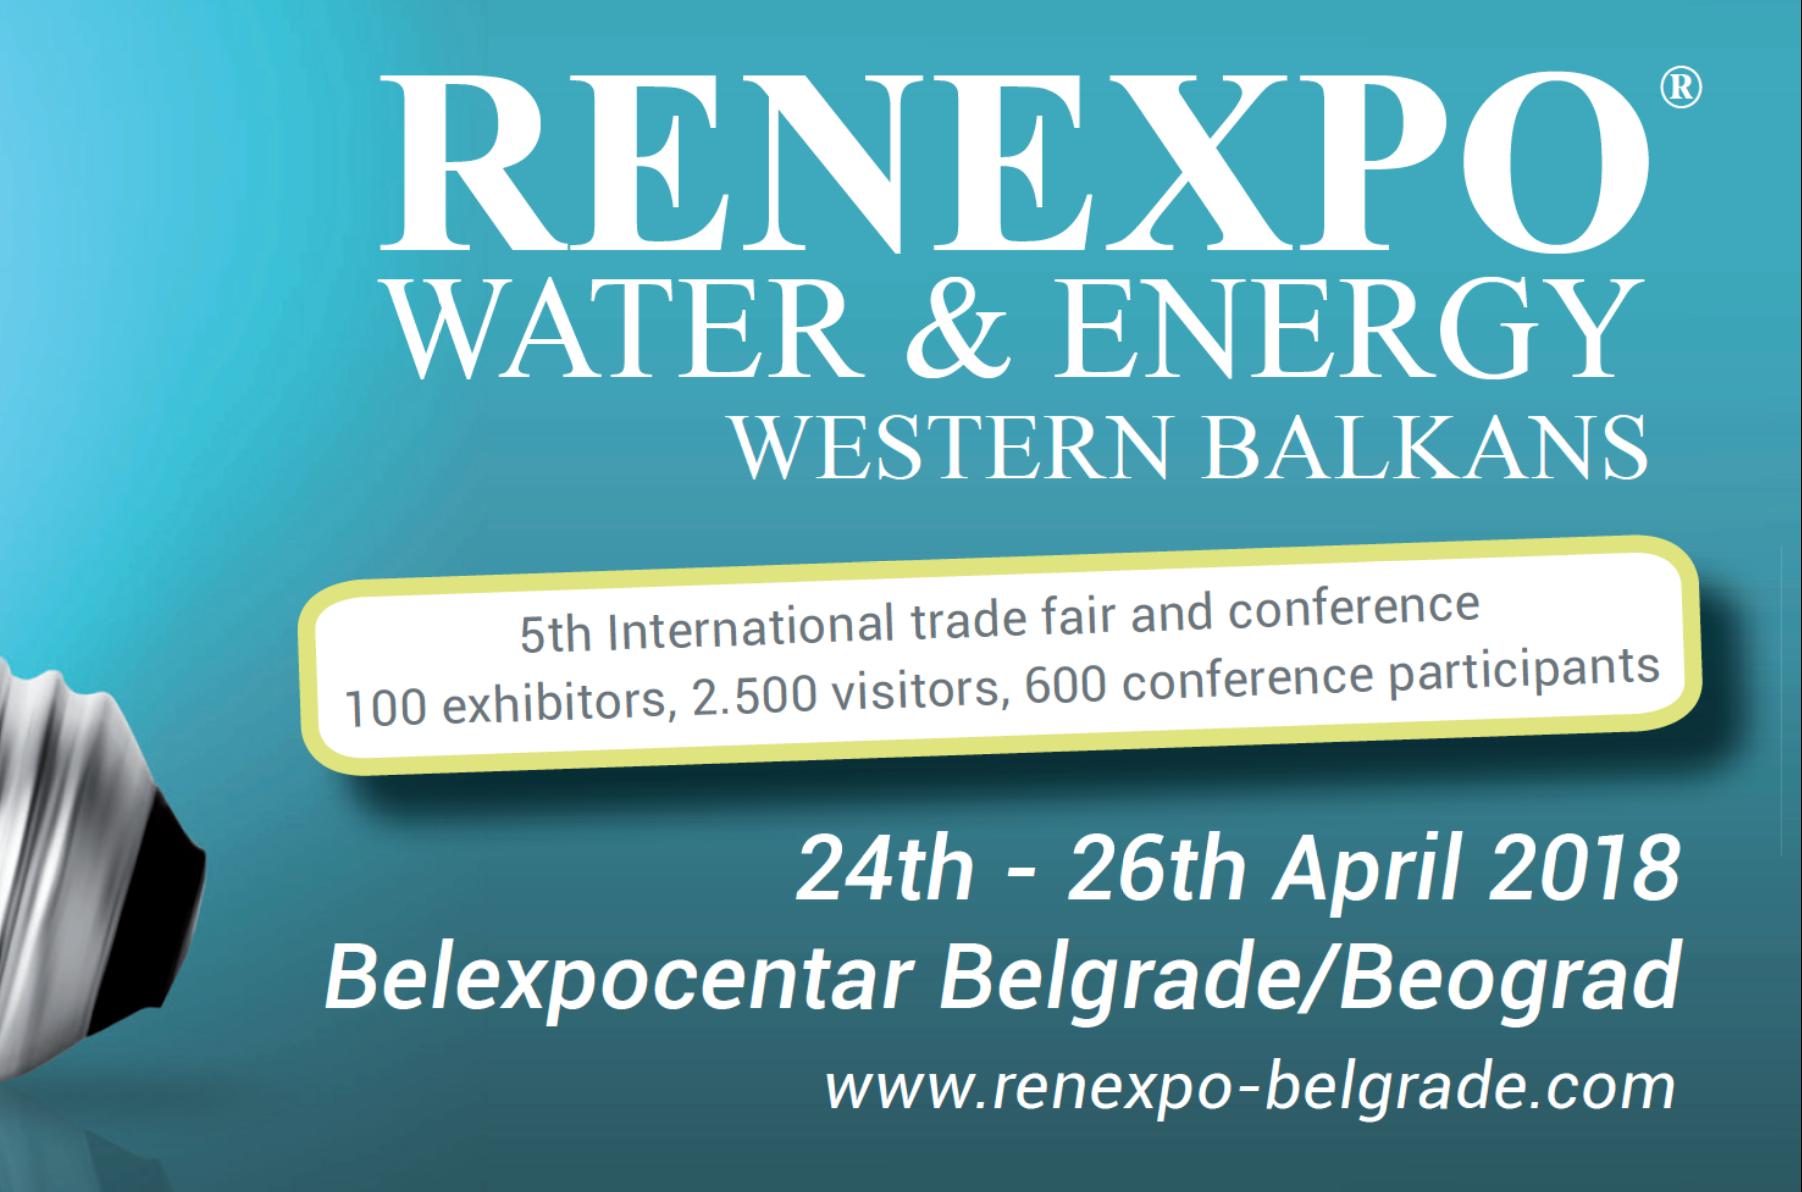 5th RENEXPO WATER & ENERGY fair in Belgrade, April 24-26